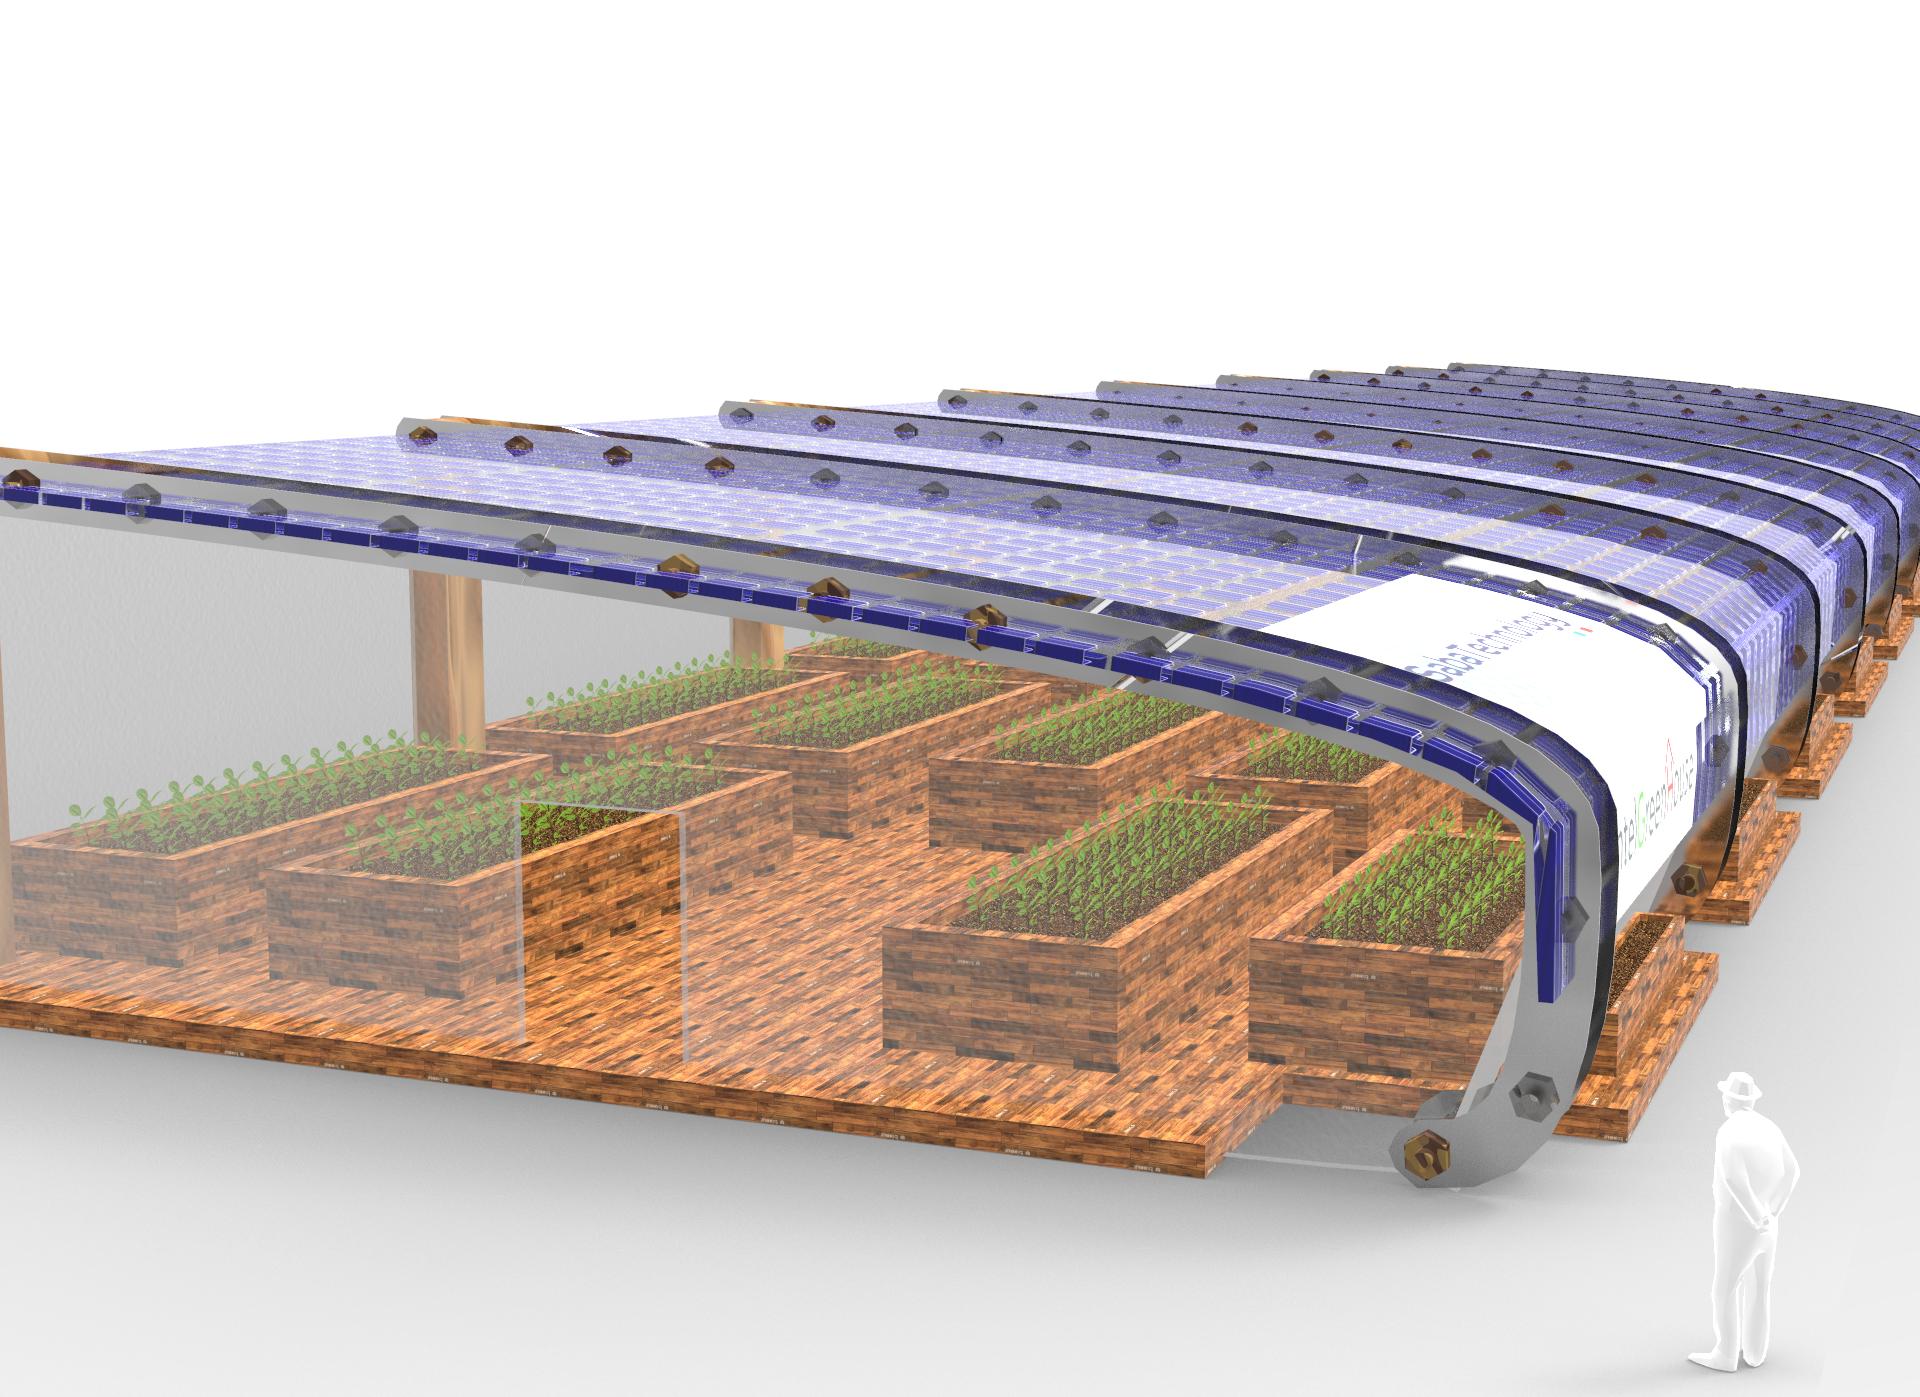 Intel Green House - Saba Technology - Water From Moisture